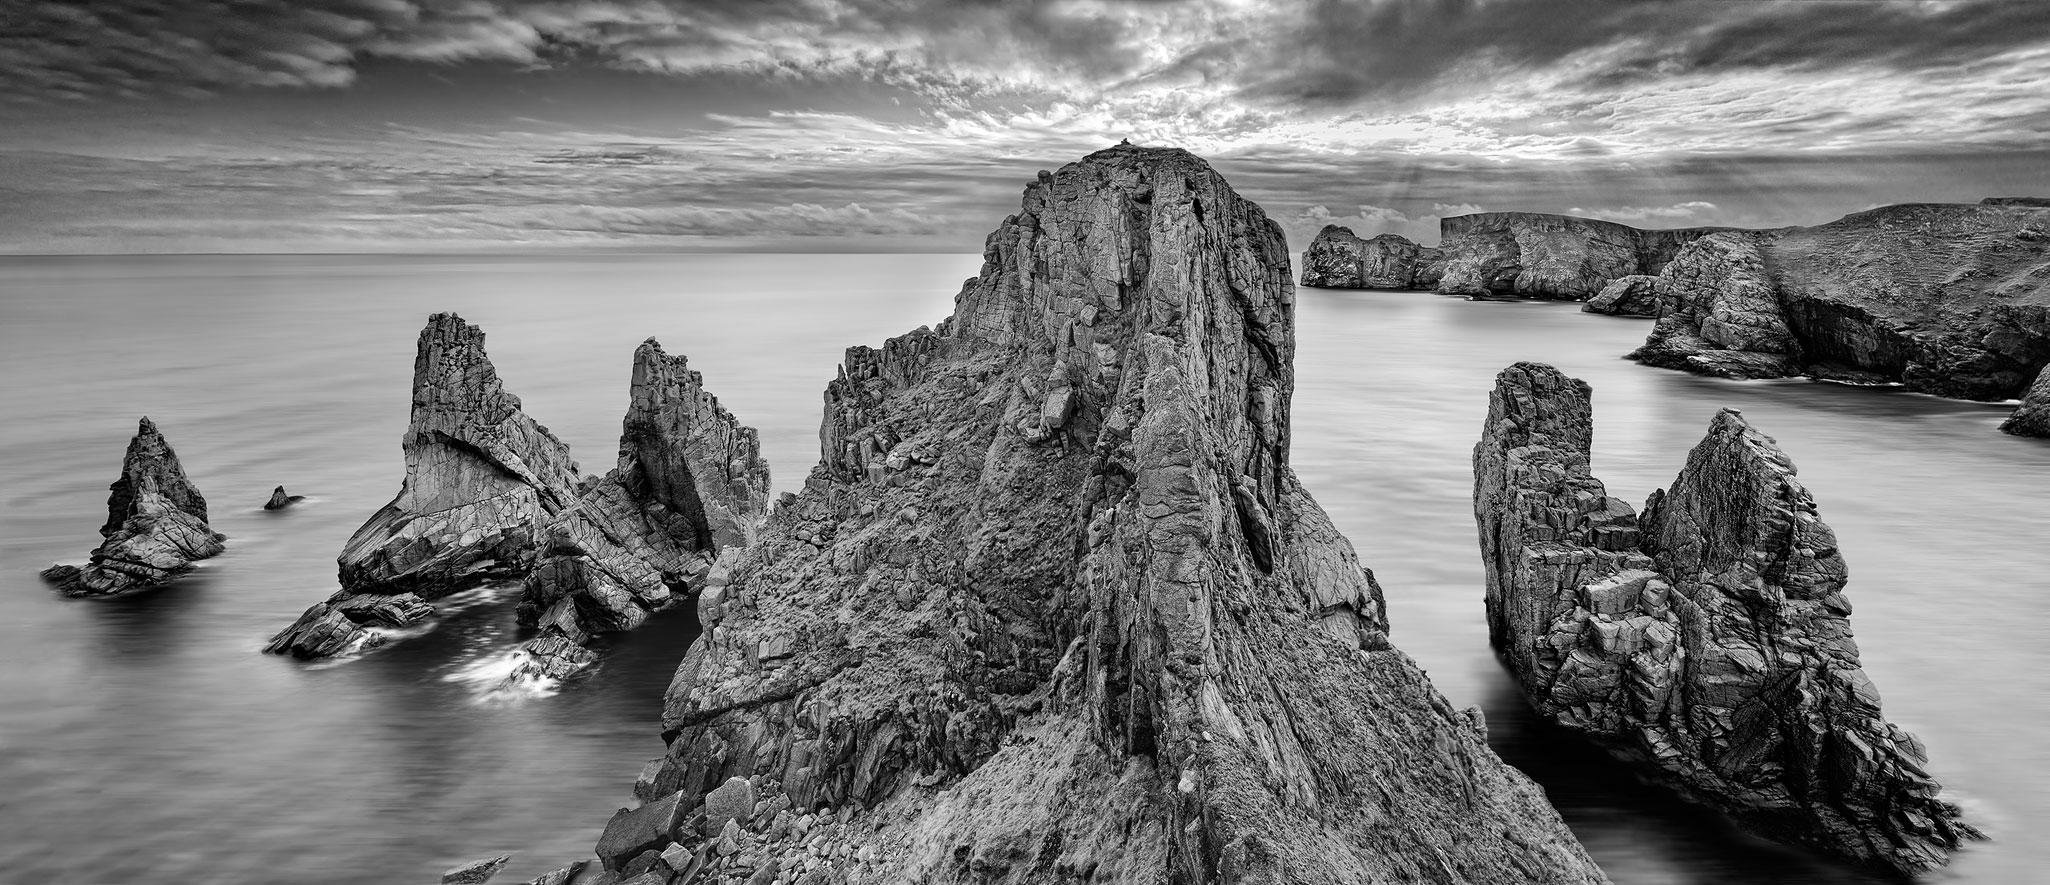 Tory Island donegal irish landscape prints